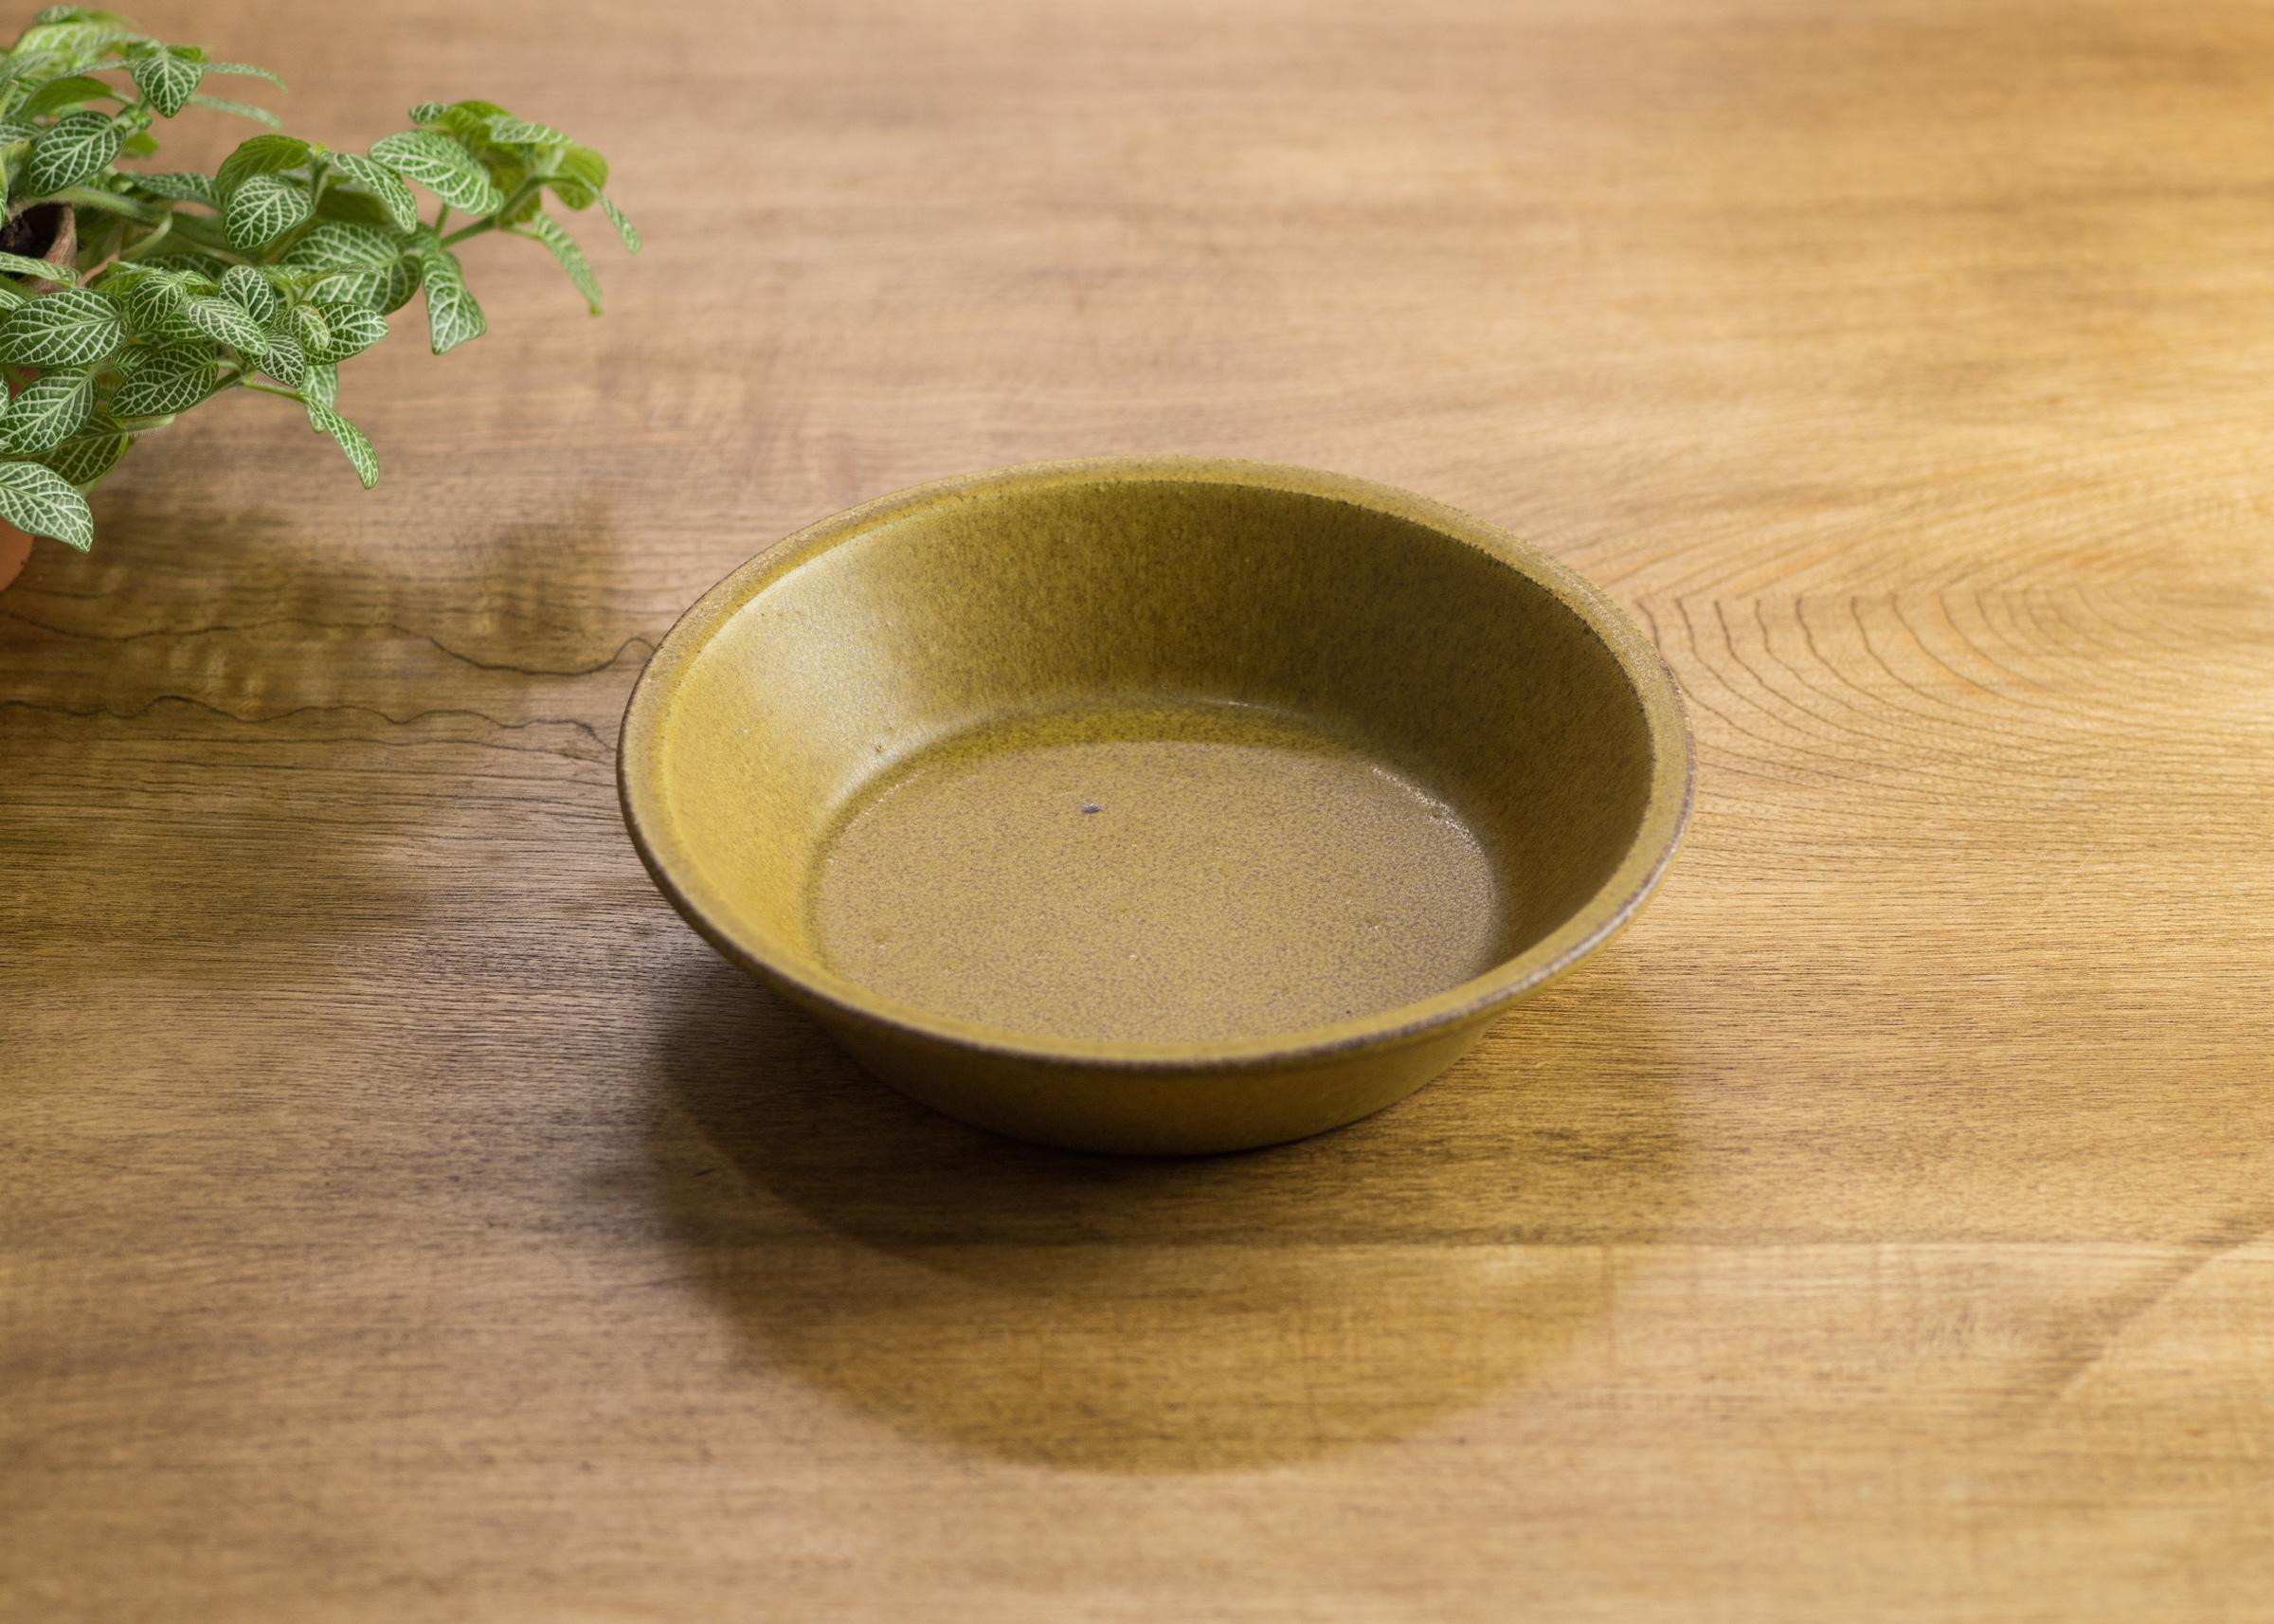 SHIROUMA 浅鉢 18cm 芥子色(深皿・スープボウル・グラタン皿・耐熱皿)/長谷川 哲也